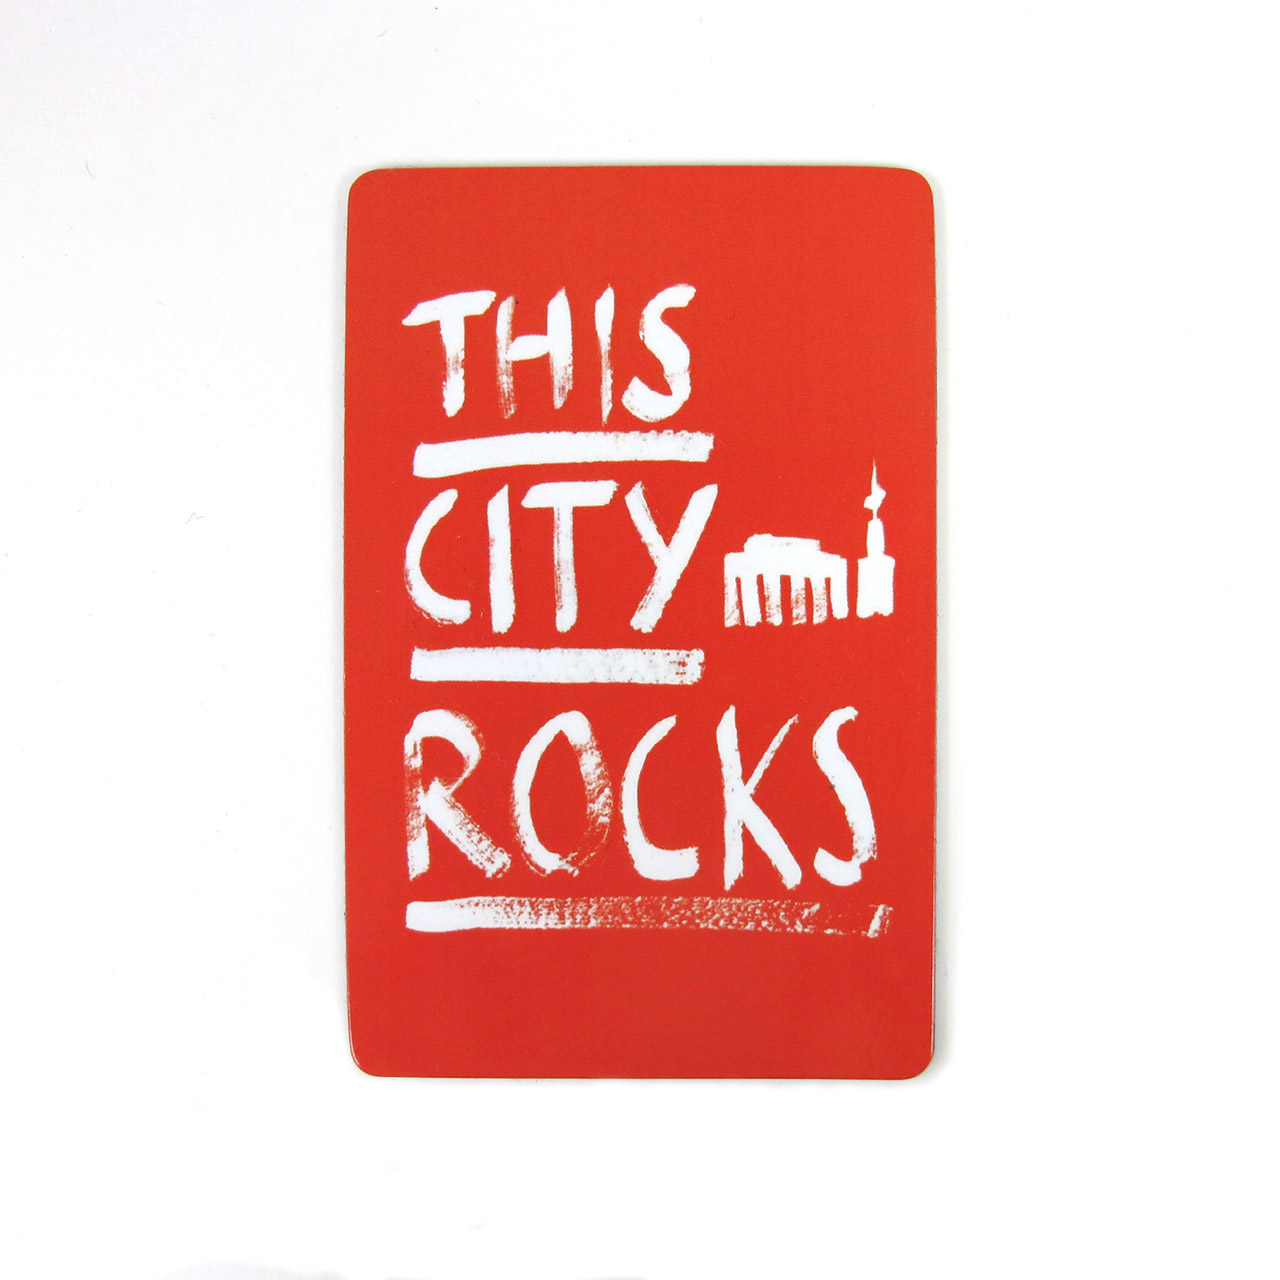 Berlinmagnet This City Rocks groß rot